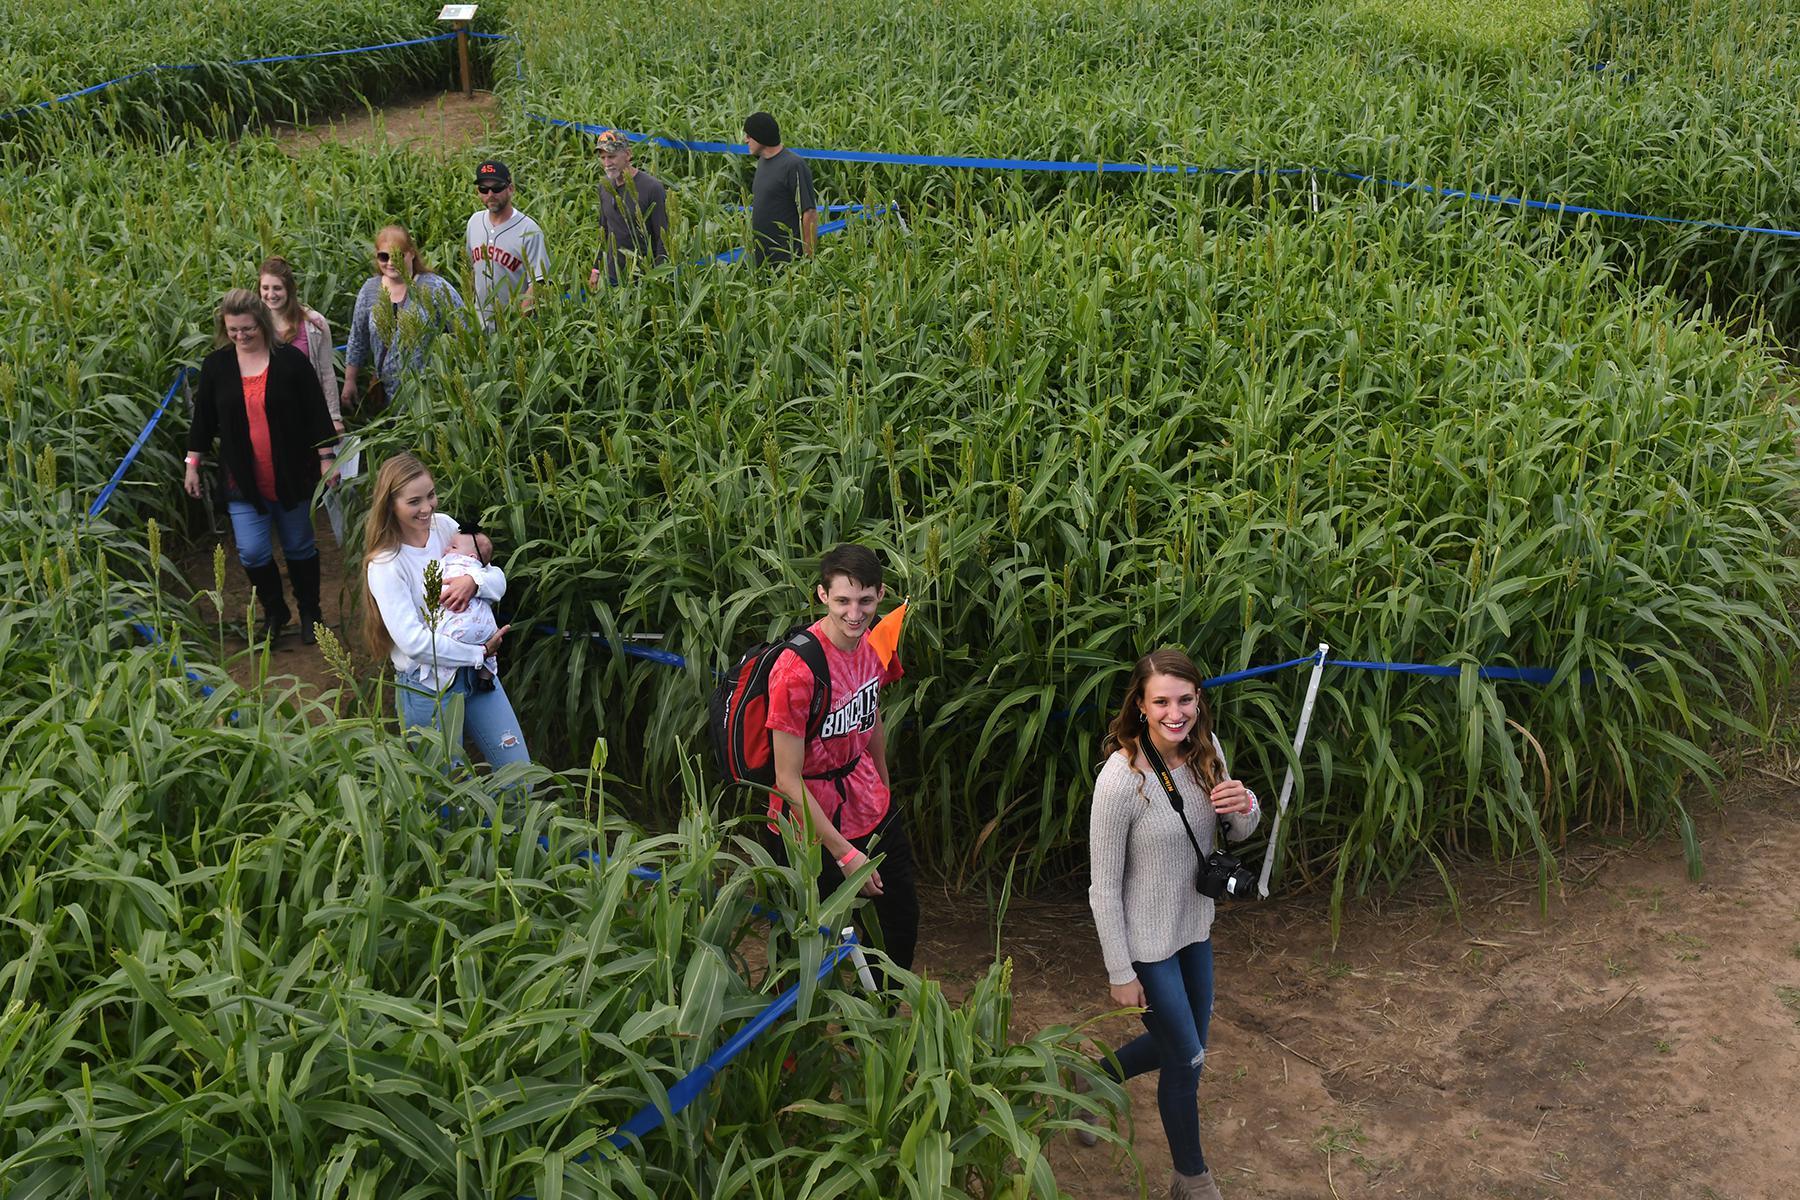 Tomball Corn Maze celebrates opening day of fourth season